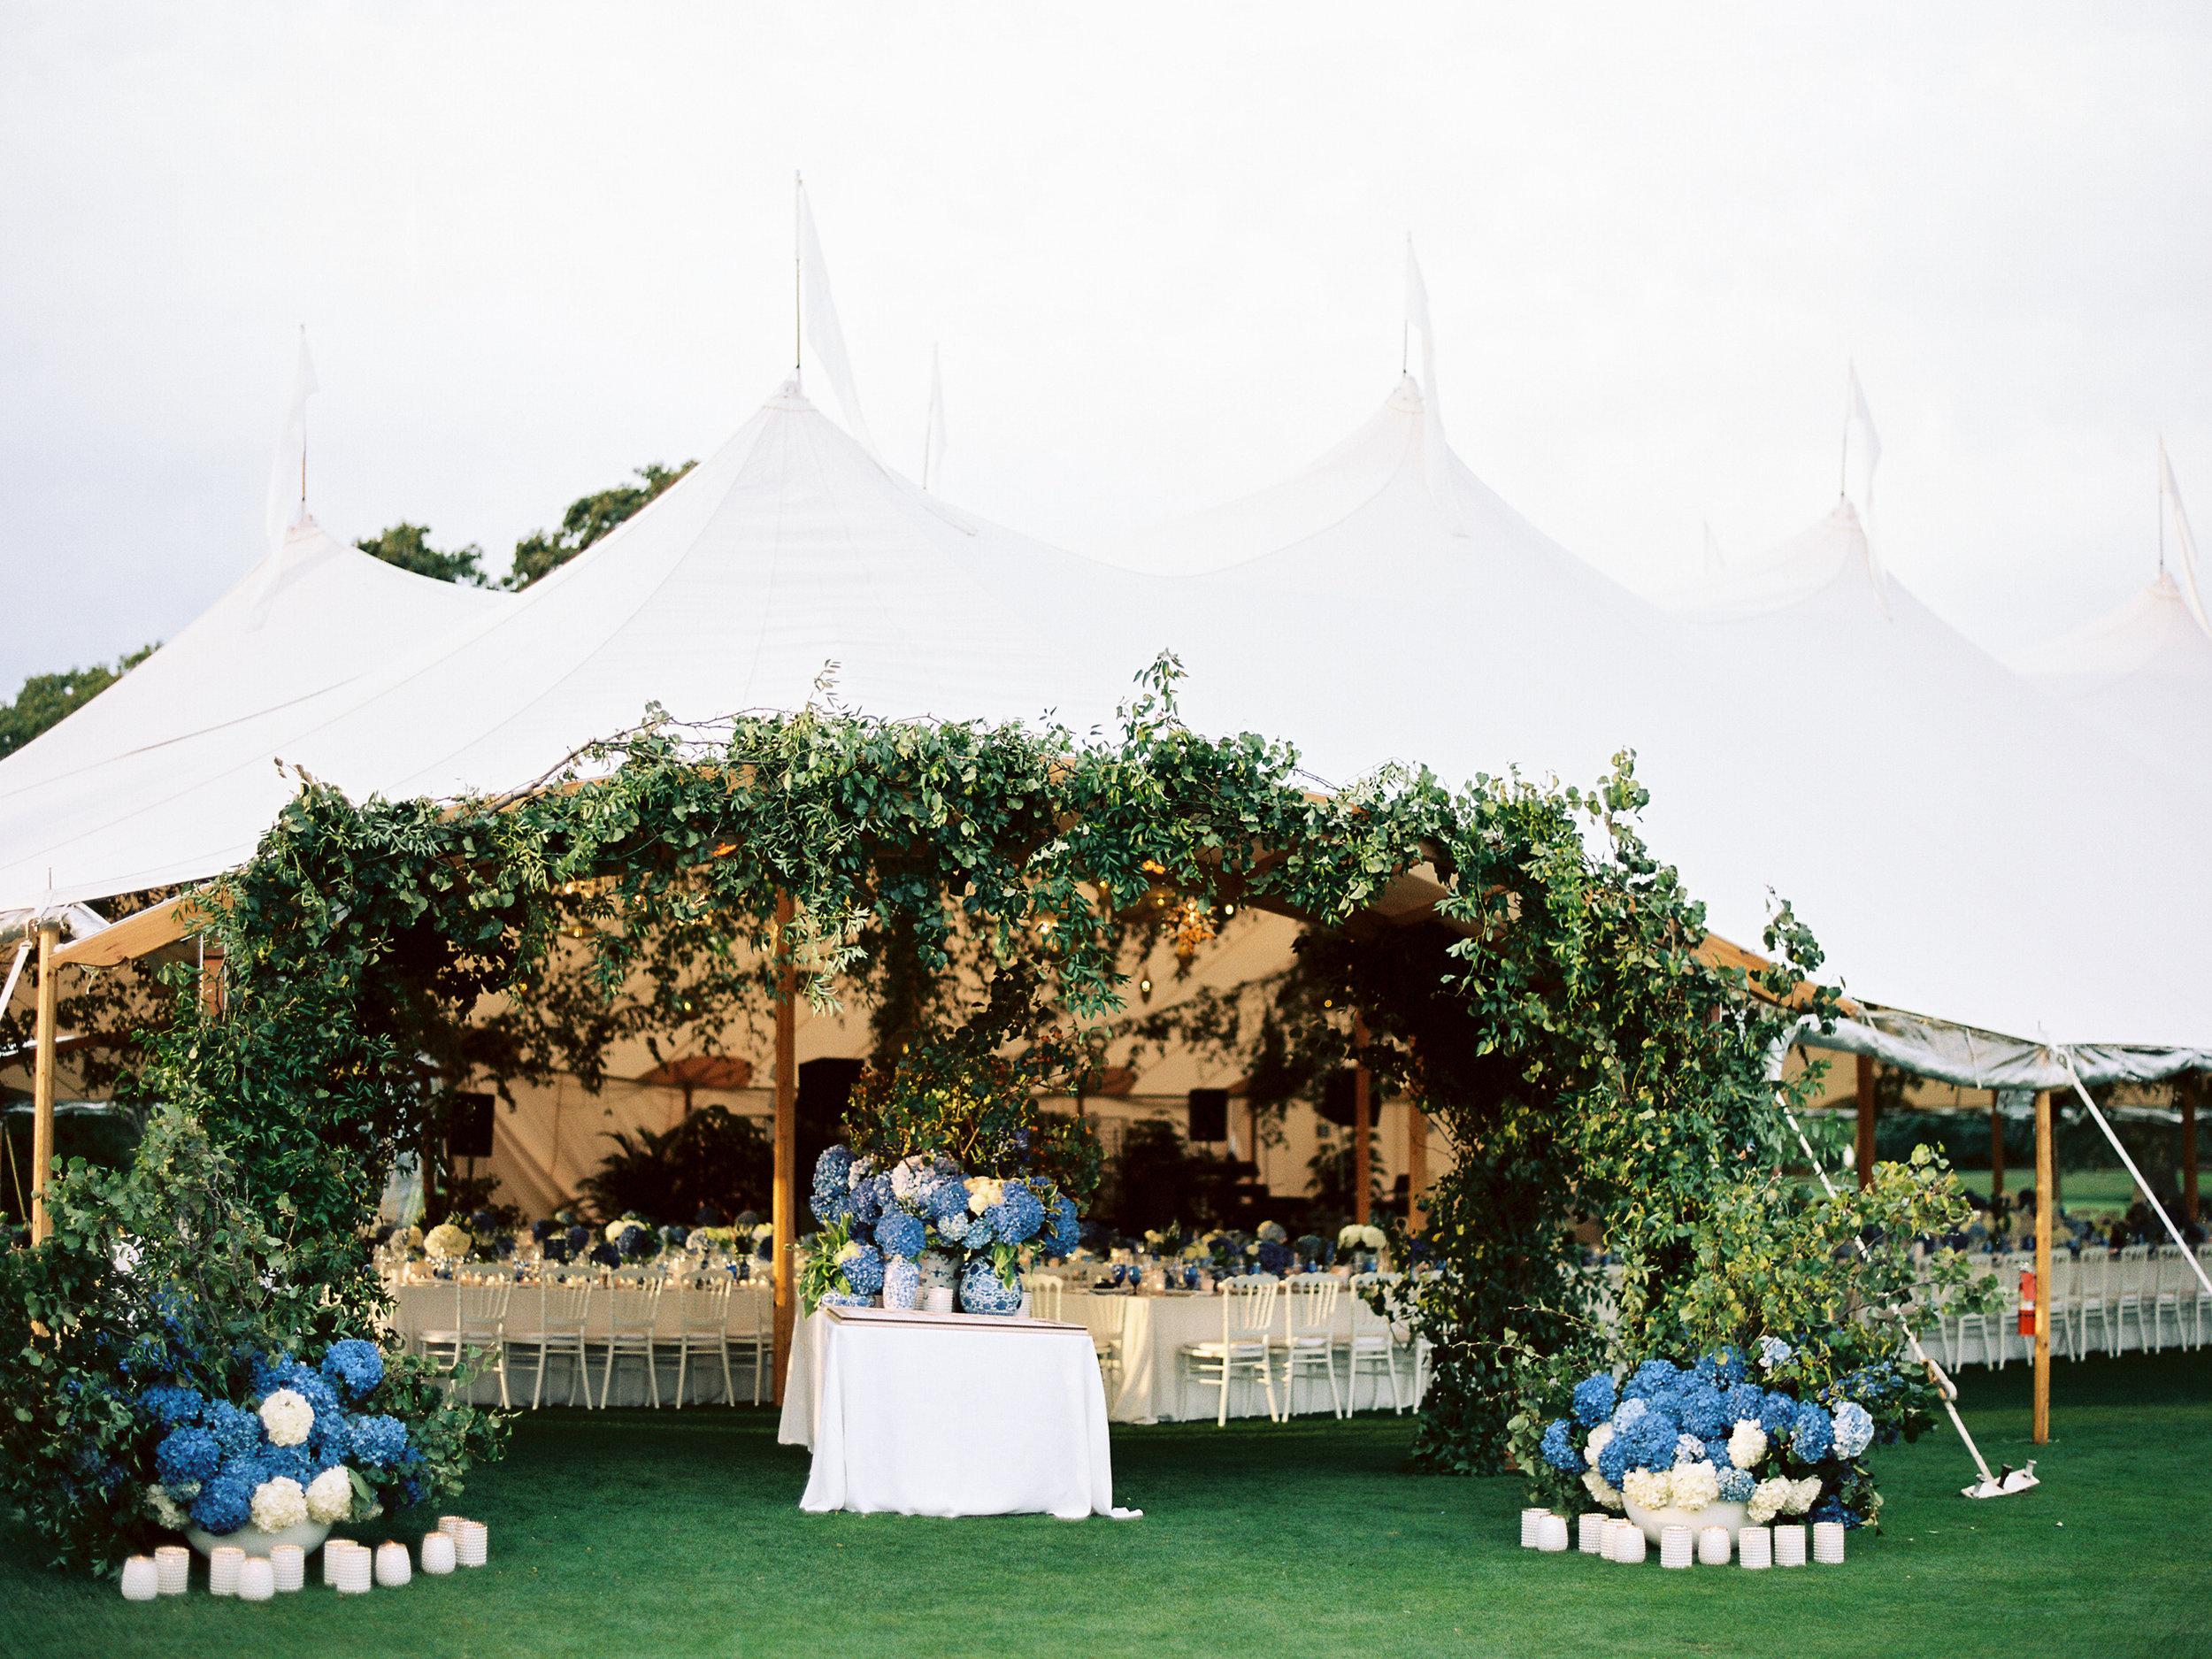 Sperry Tent Wedding, Sail cloth Tent Wedding, Blue Hydrangea, Escort Card Table, Smilax, Candles, Coastal Chic Wedding, Nicole Simeral Wedding Planner